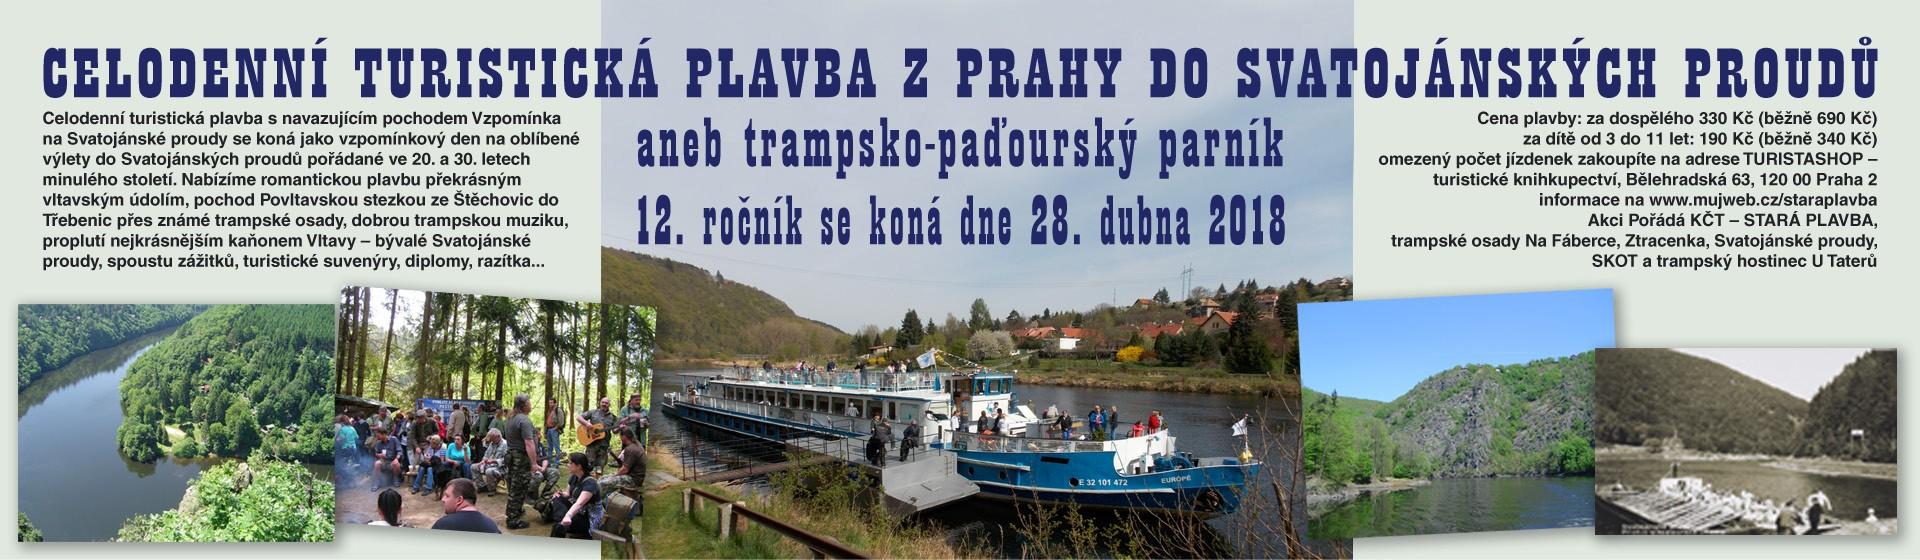 Turistická plavba Z Prahy do Svatojánských proudů aneb trampsko-paďourský parník 28. 4. 2018 - 12. ročník